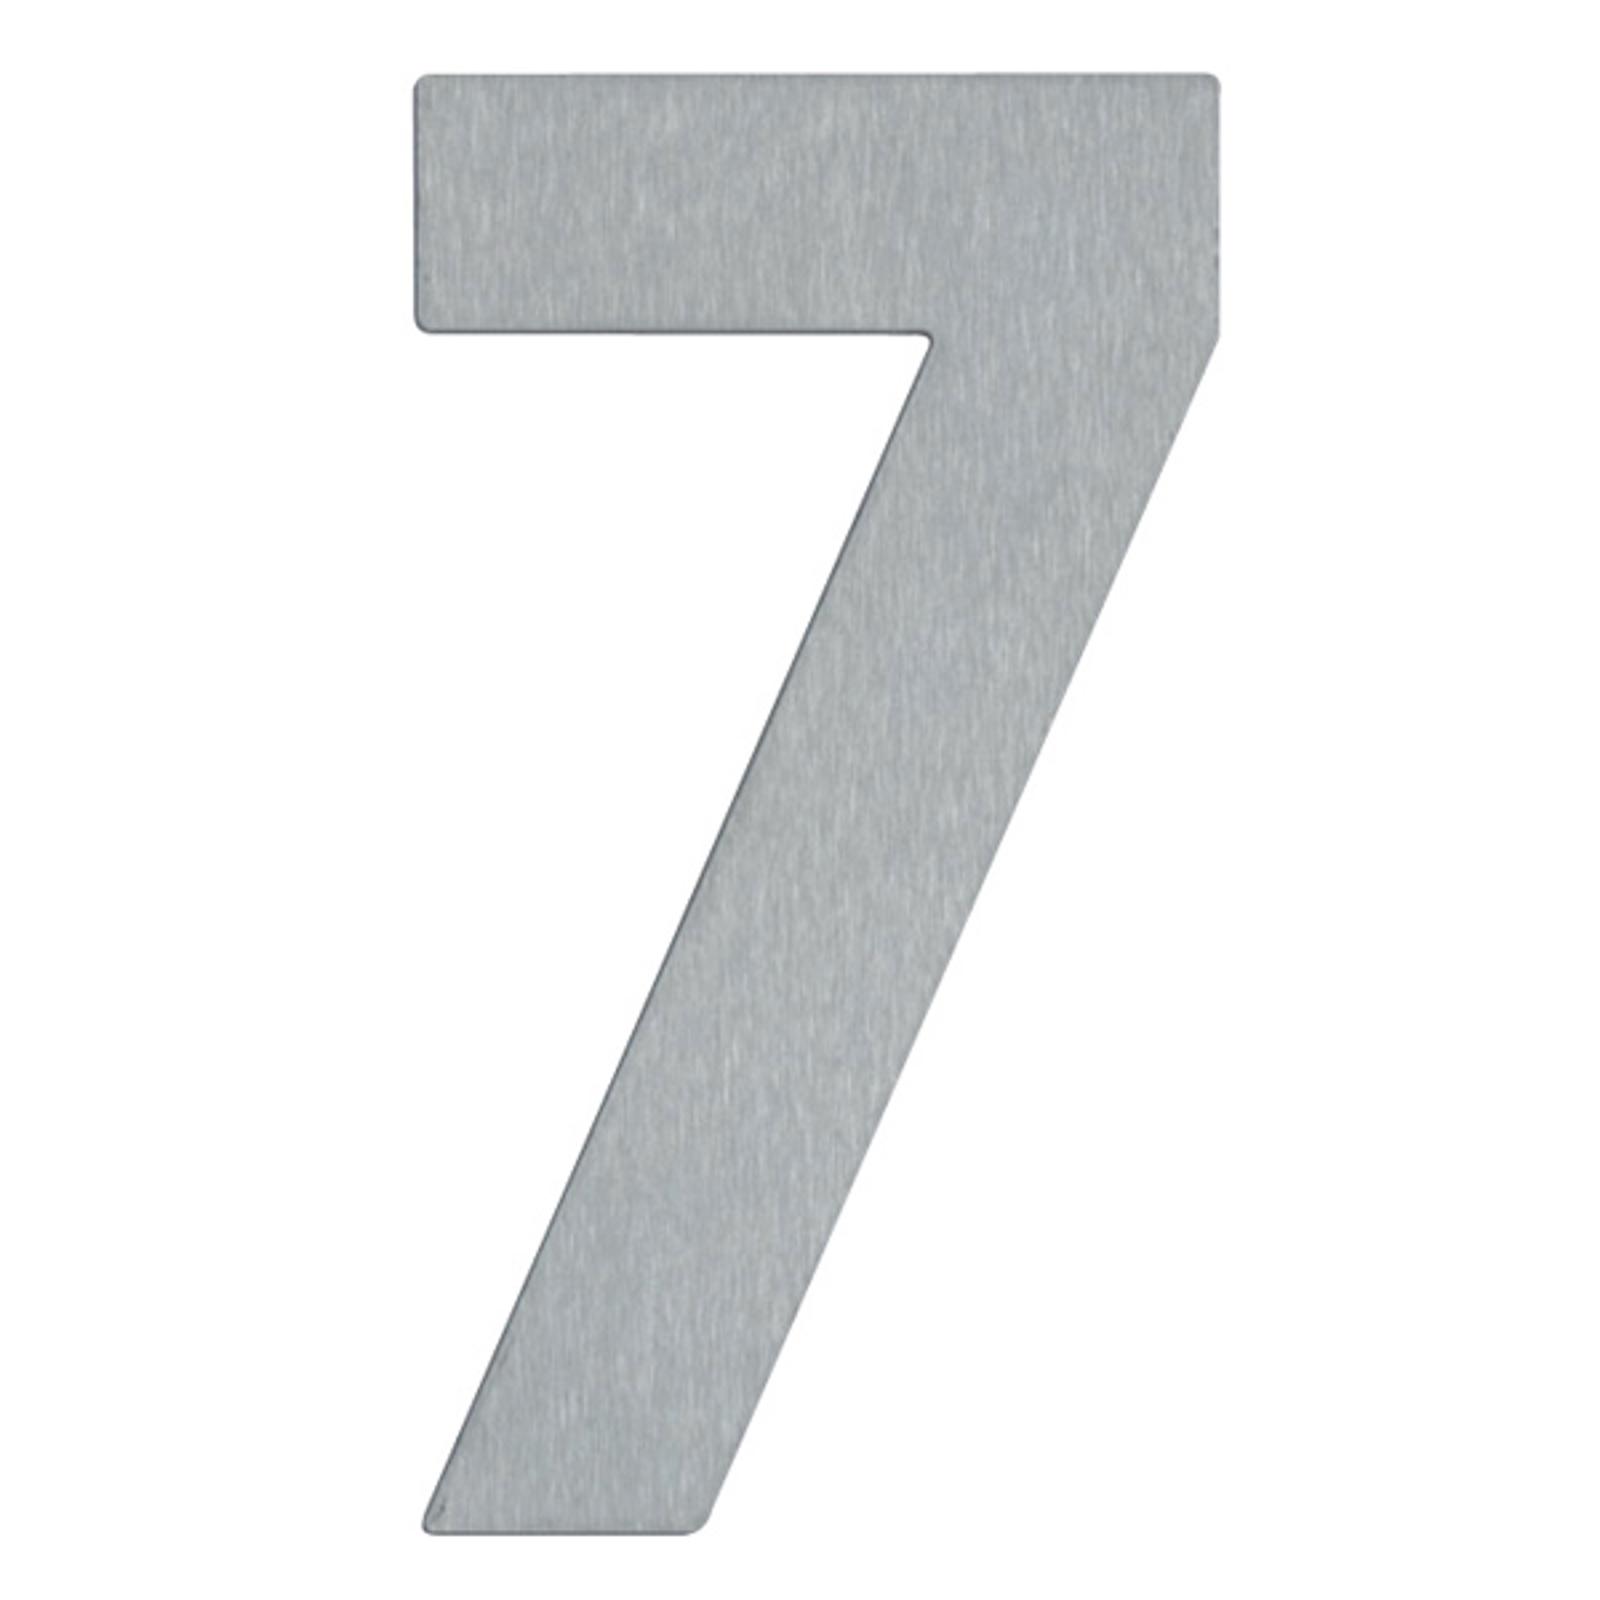 Numer domu 7   ze stali szlachetnej